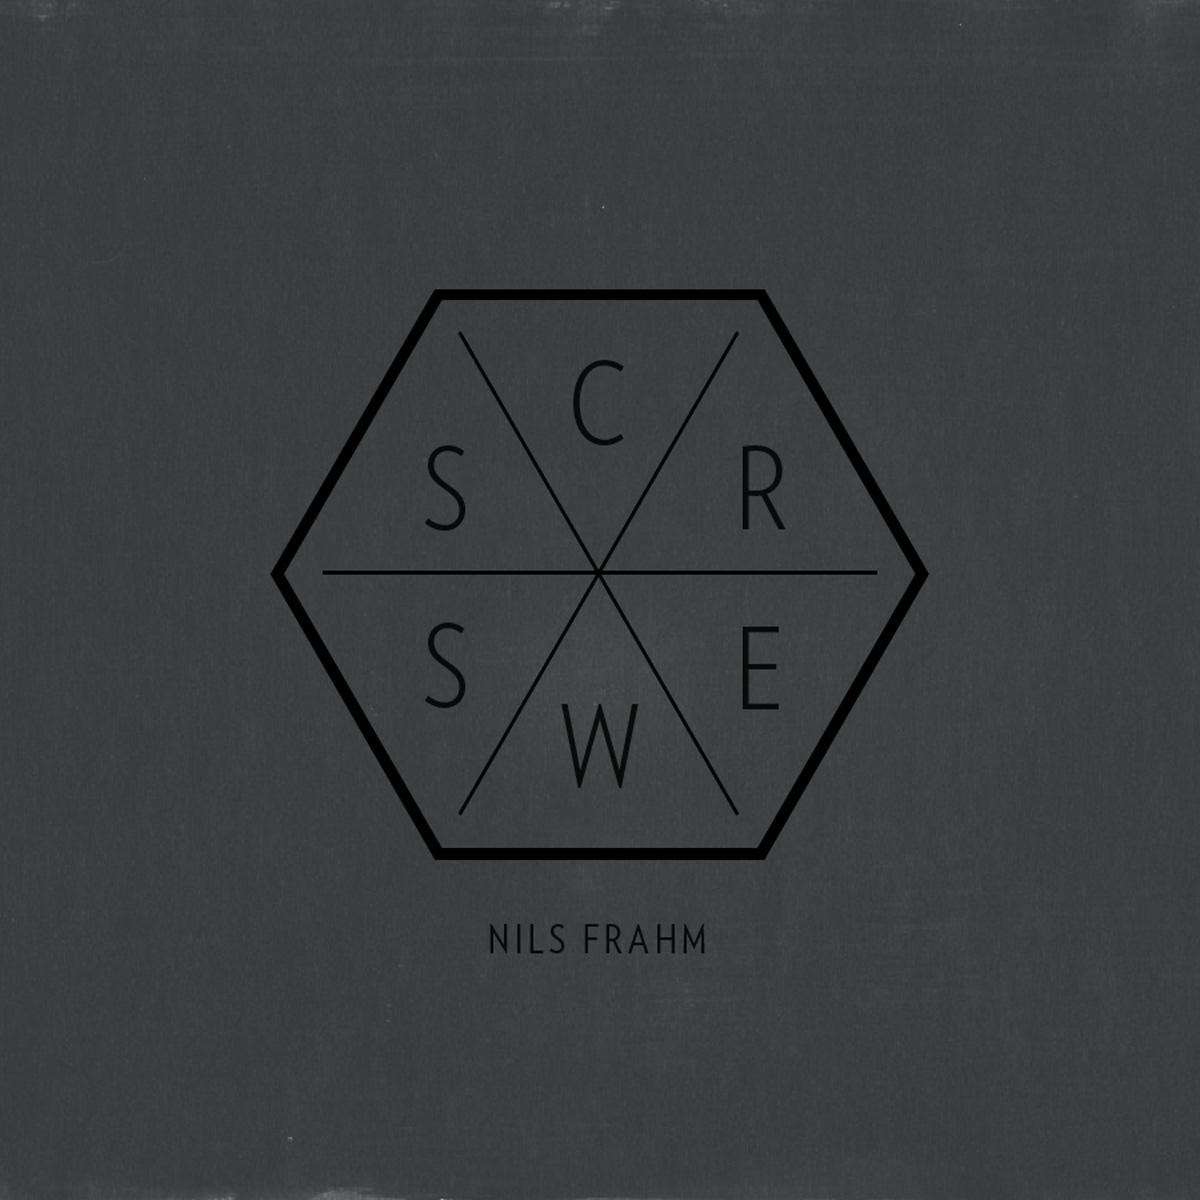 Nils Frahm - 'Screws'